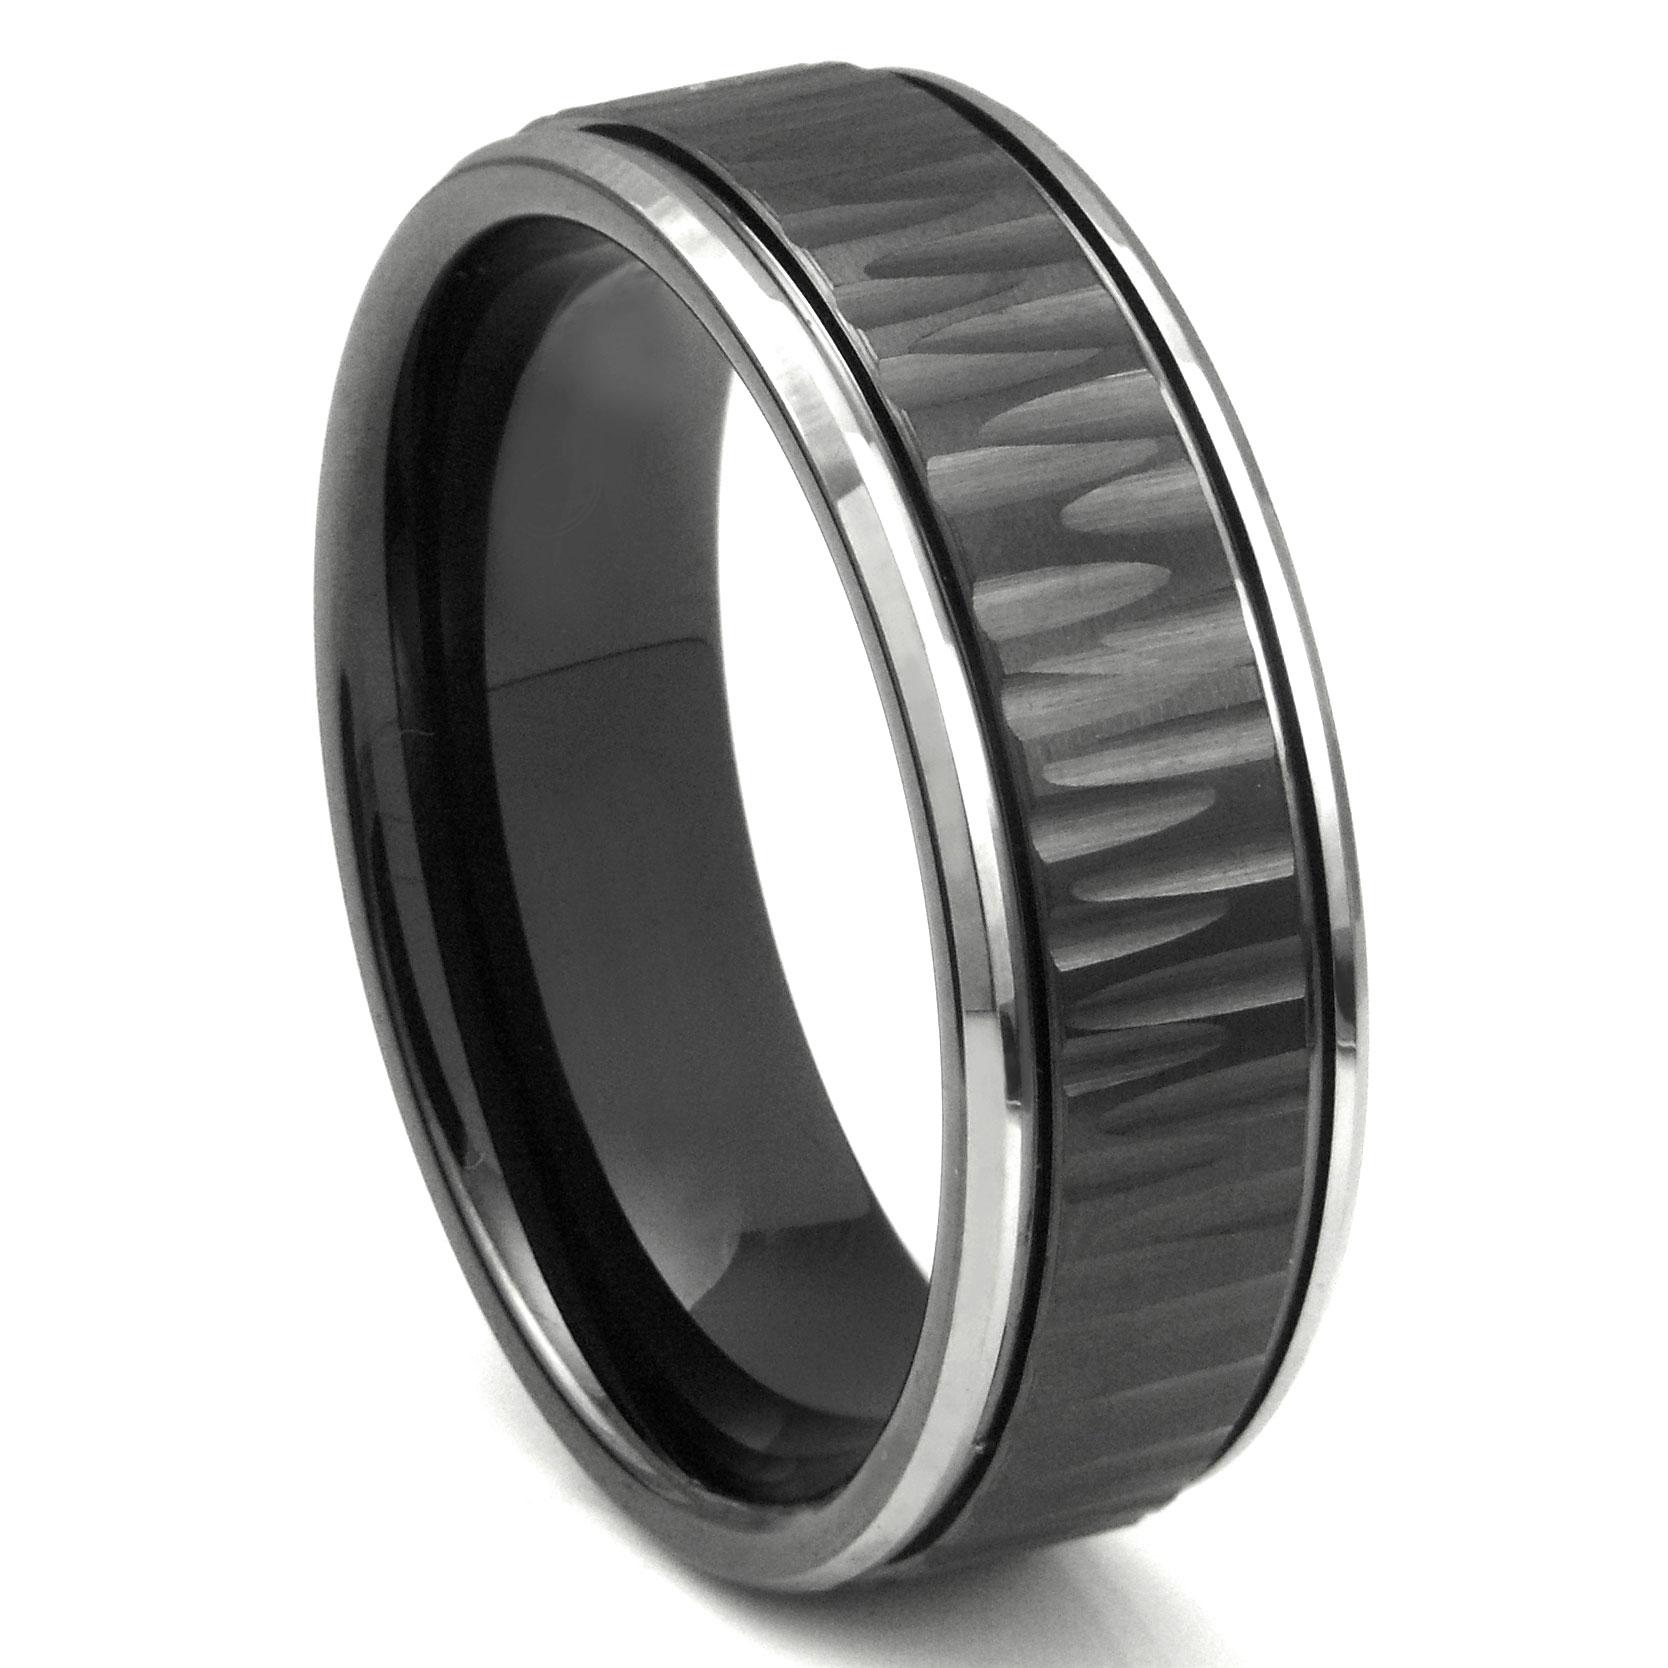 Black Tungsten Carbide 8MM Hammer Finish Newport Wedding Band Ring P tungsten wedding band Home Men s Tungsten Carbide Rings Loading zoom